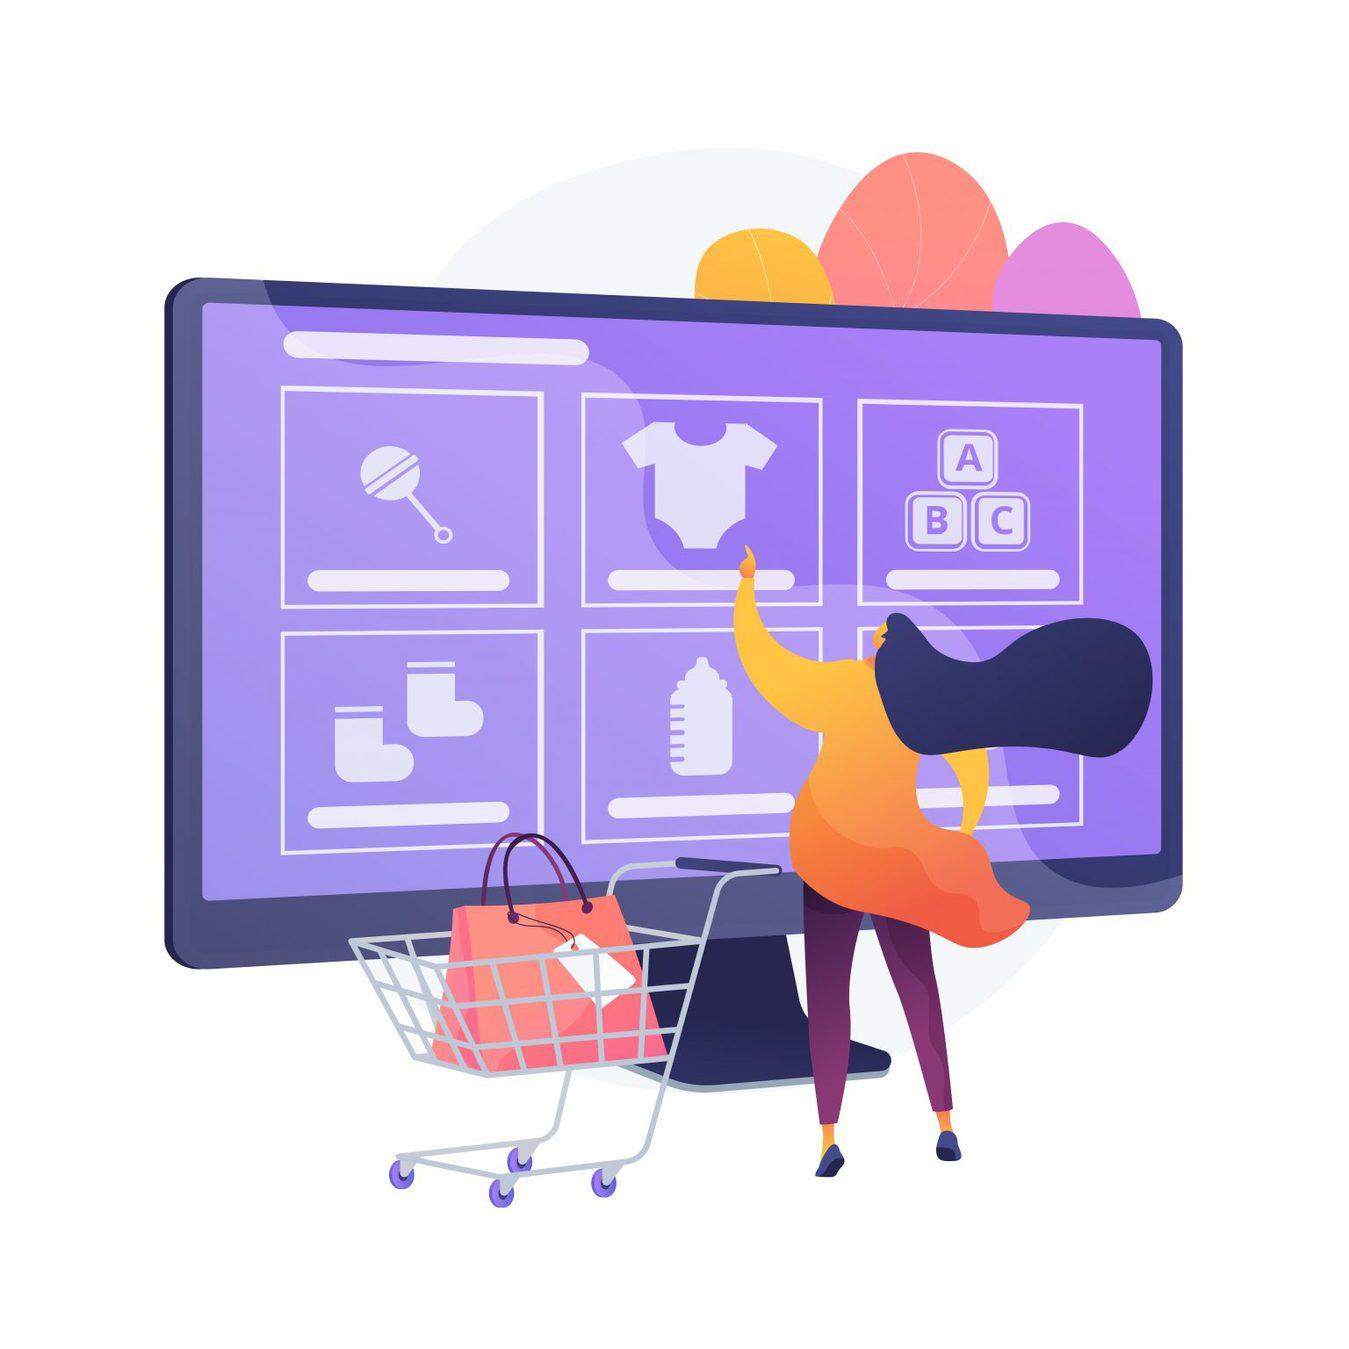 An illustration of an online shopper on a computer